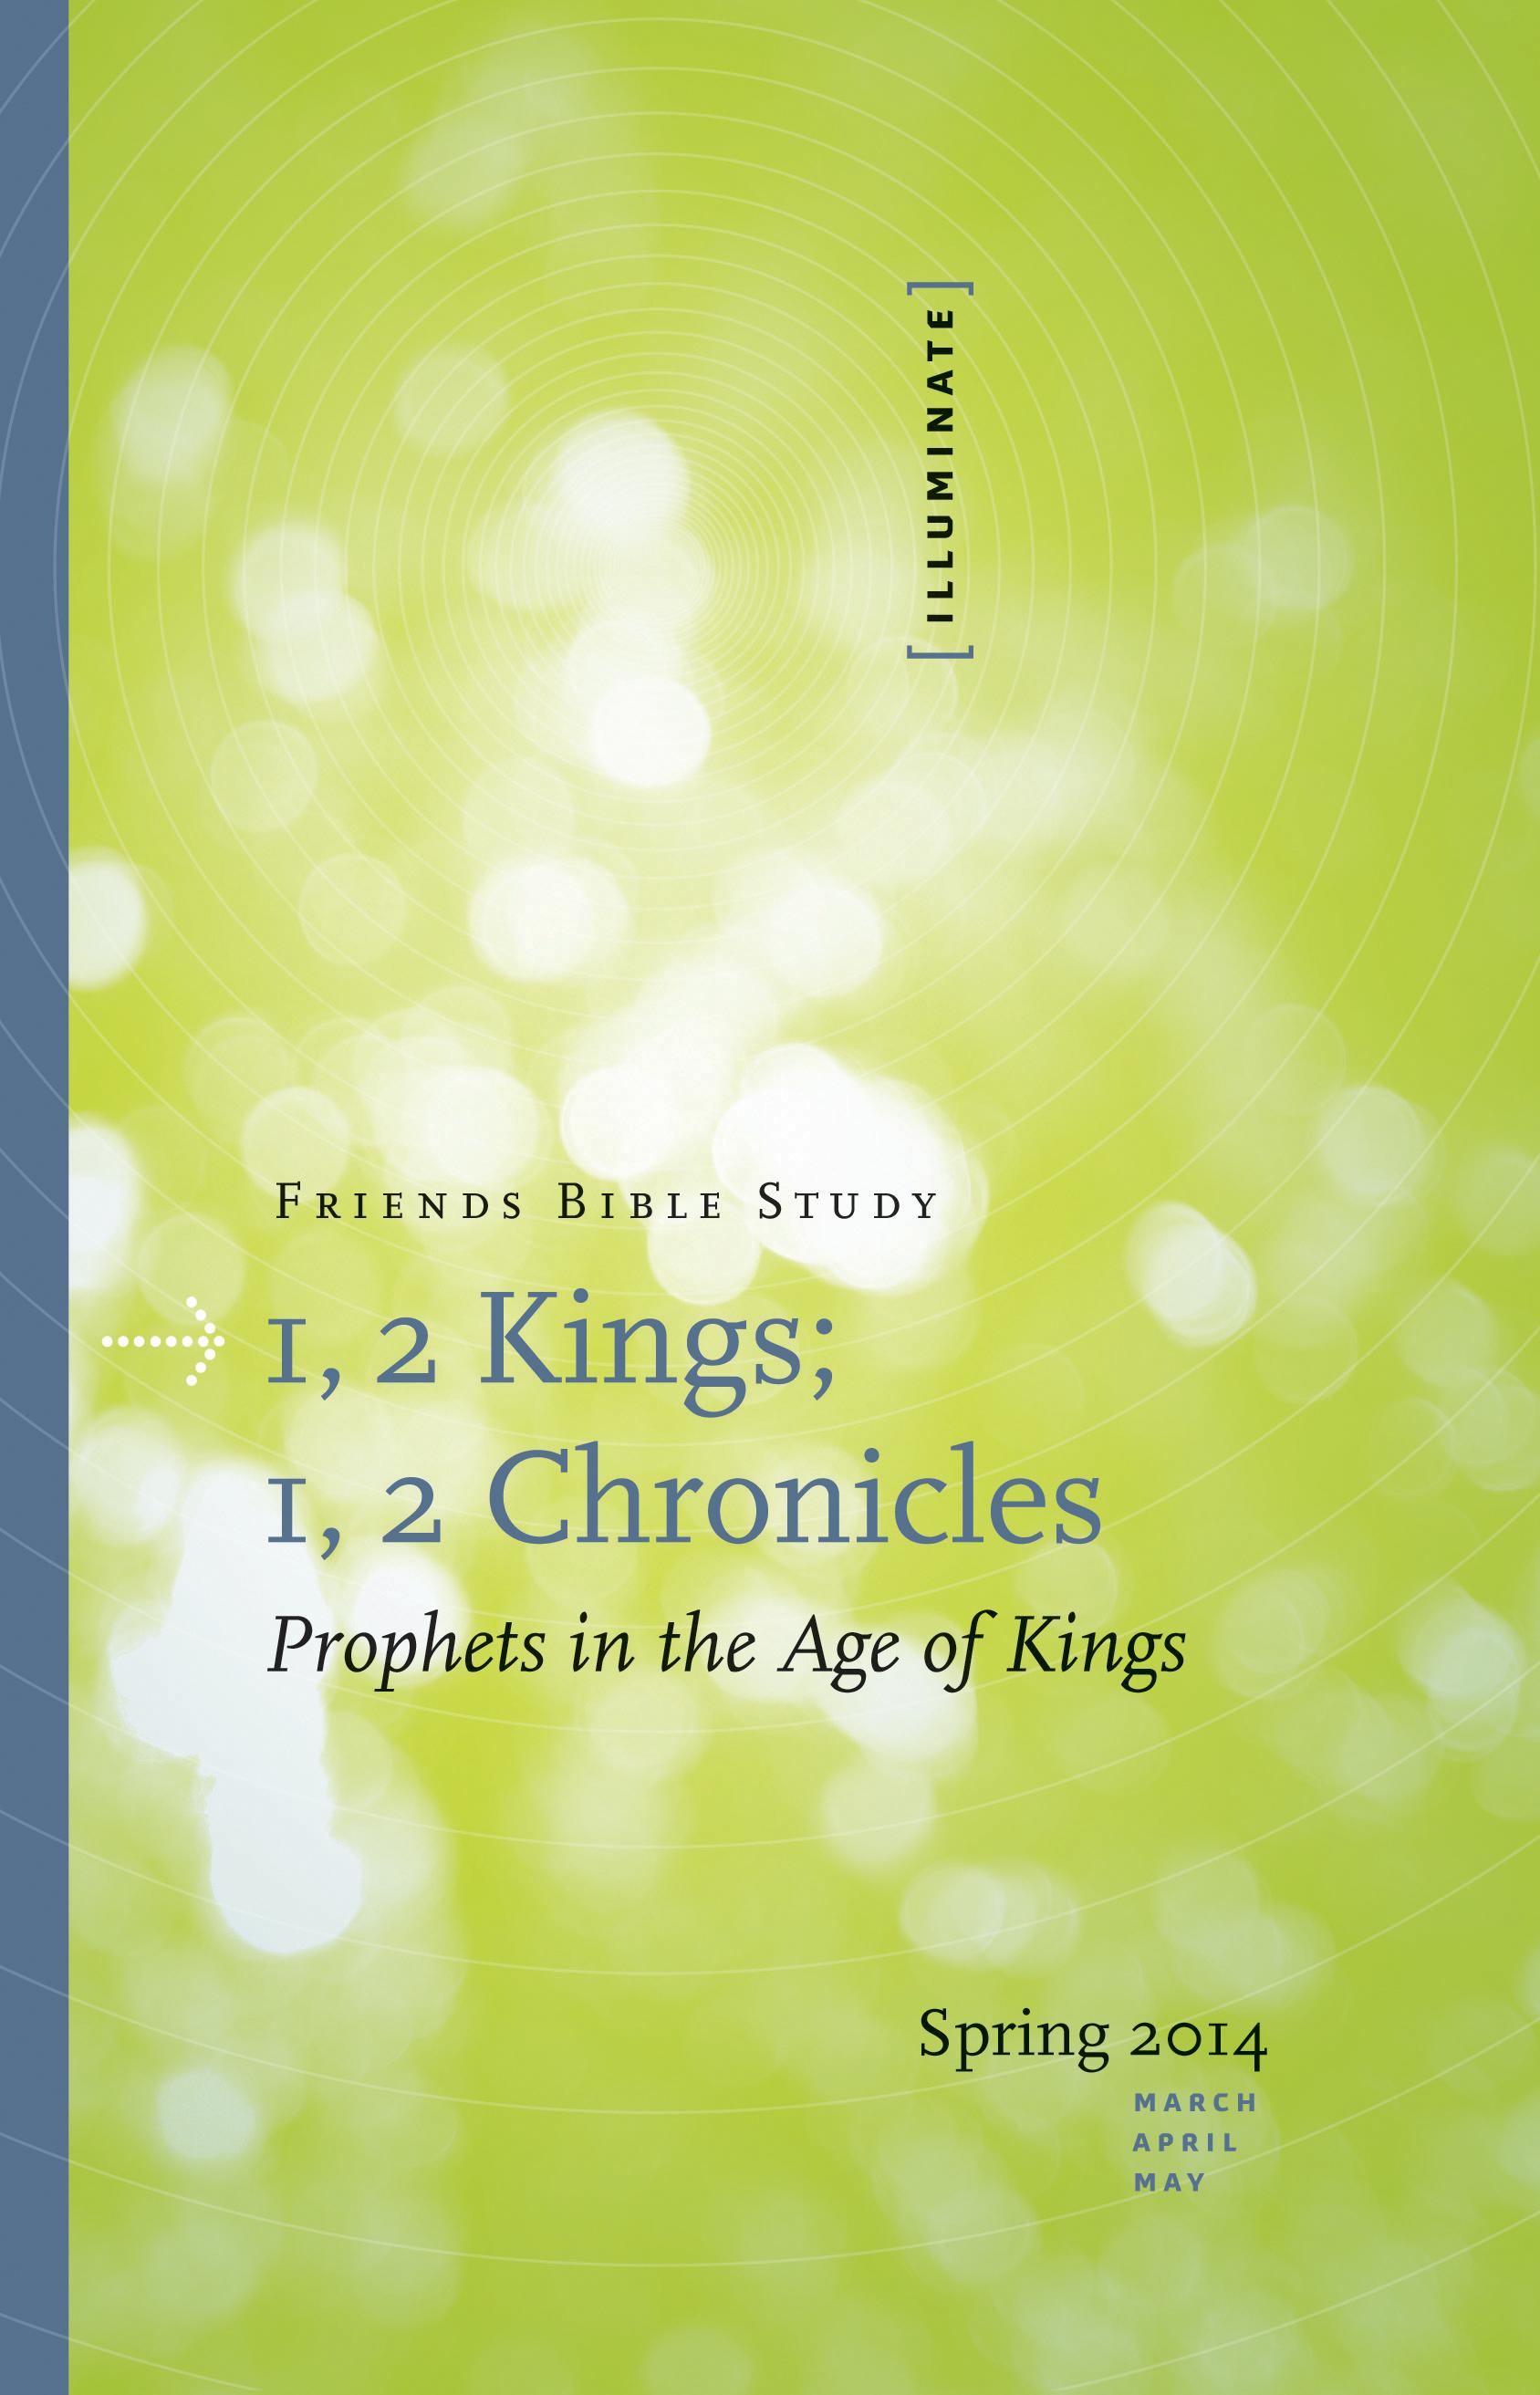 1, 2 Kings; 1, 2 Chronicles